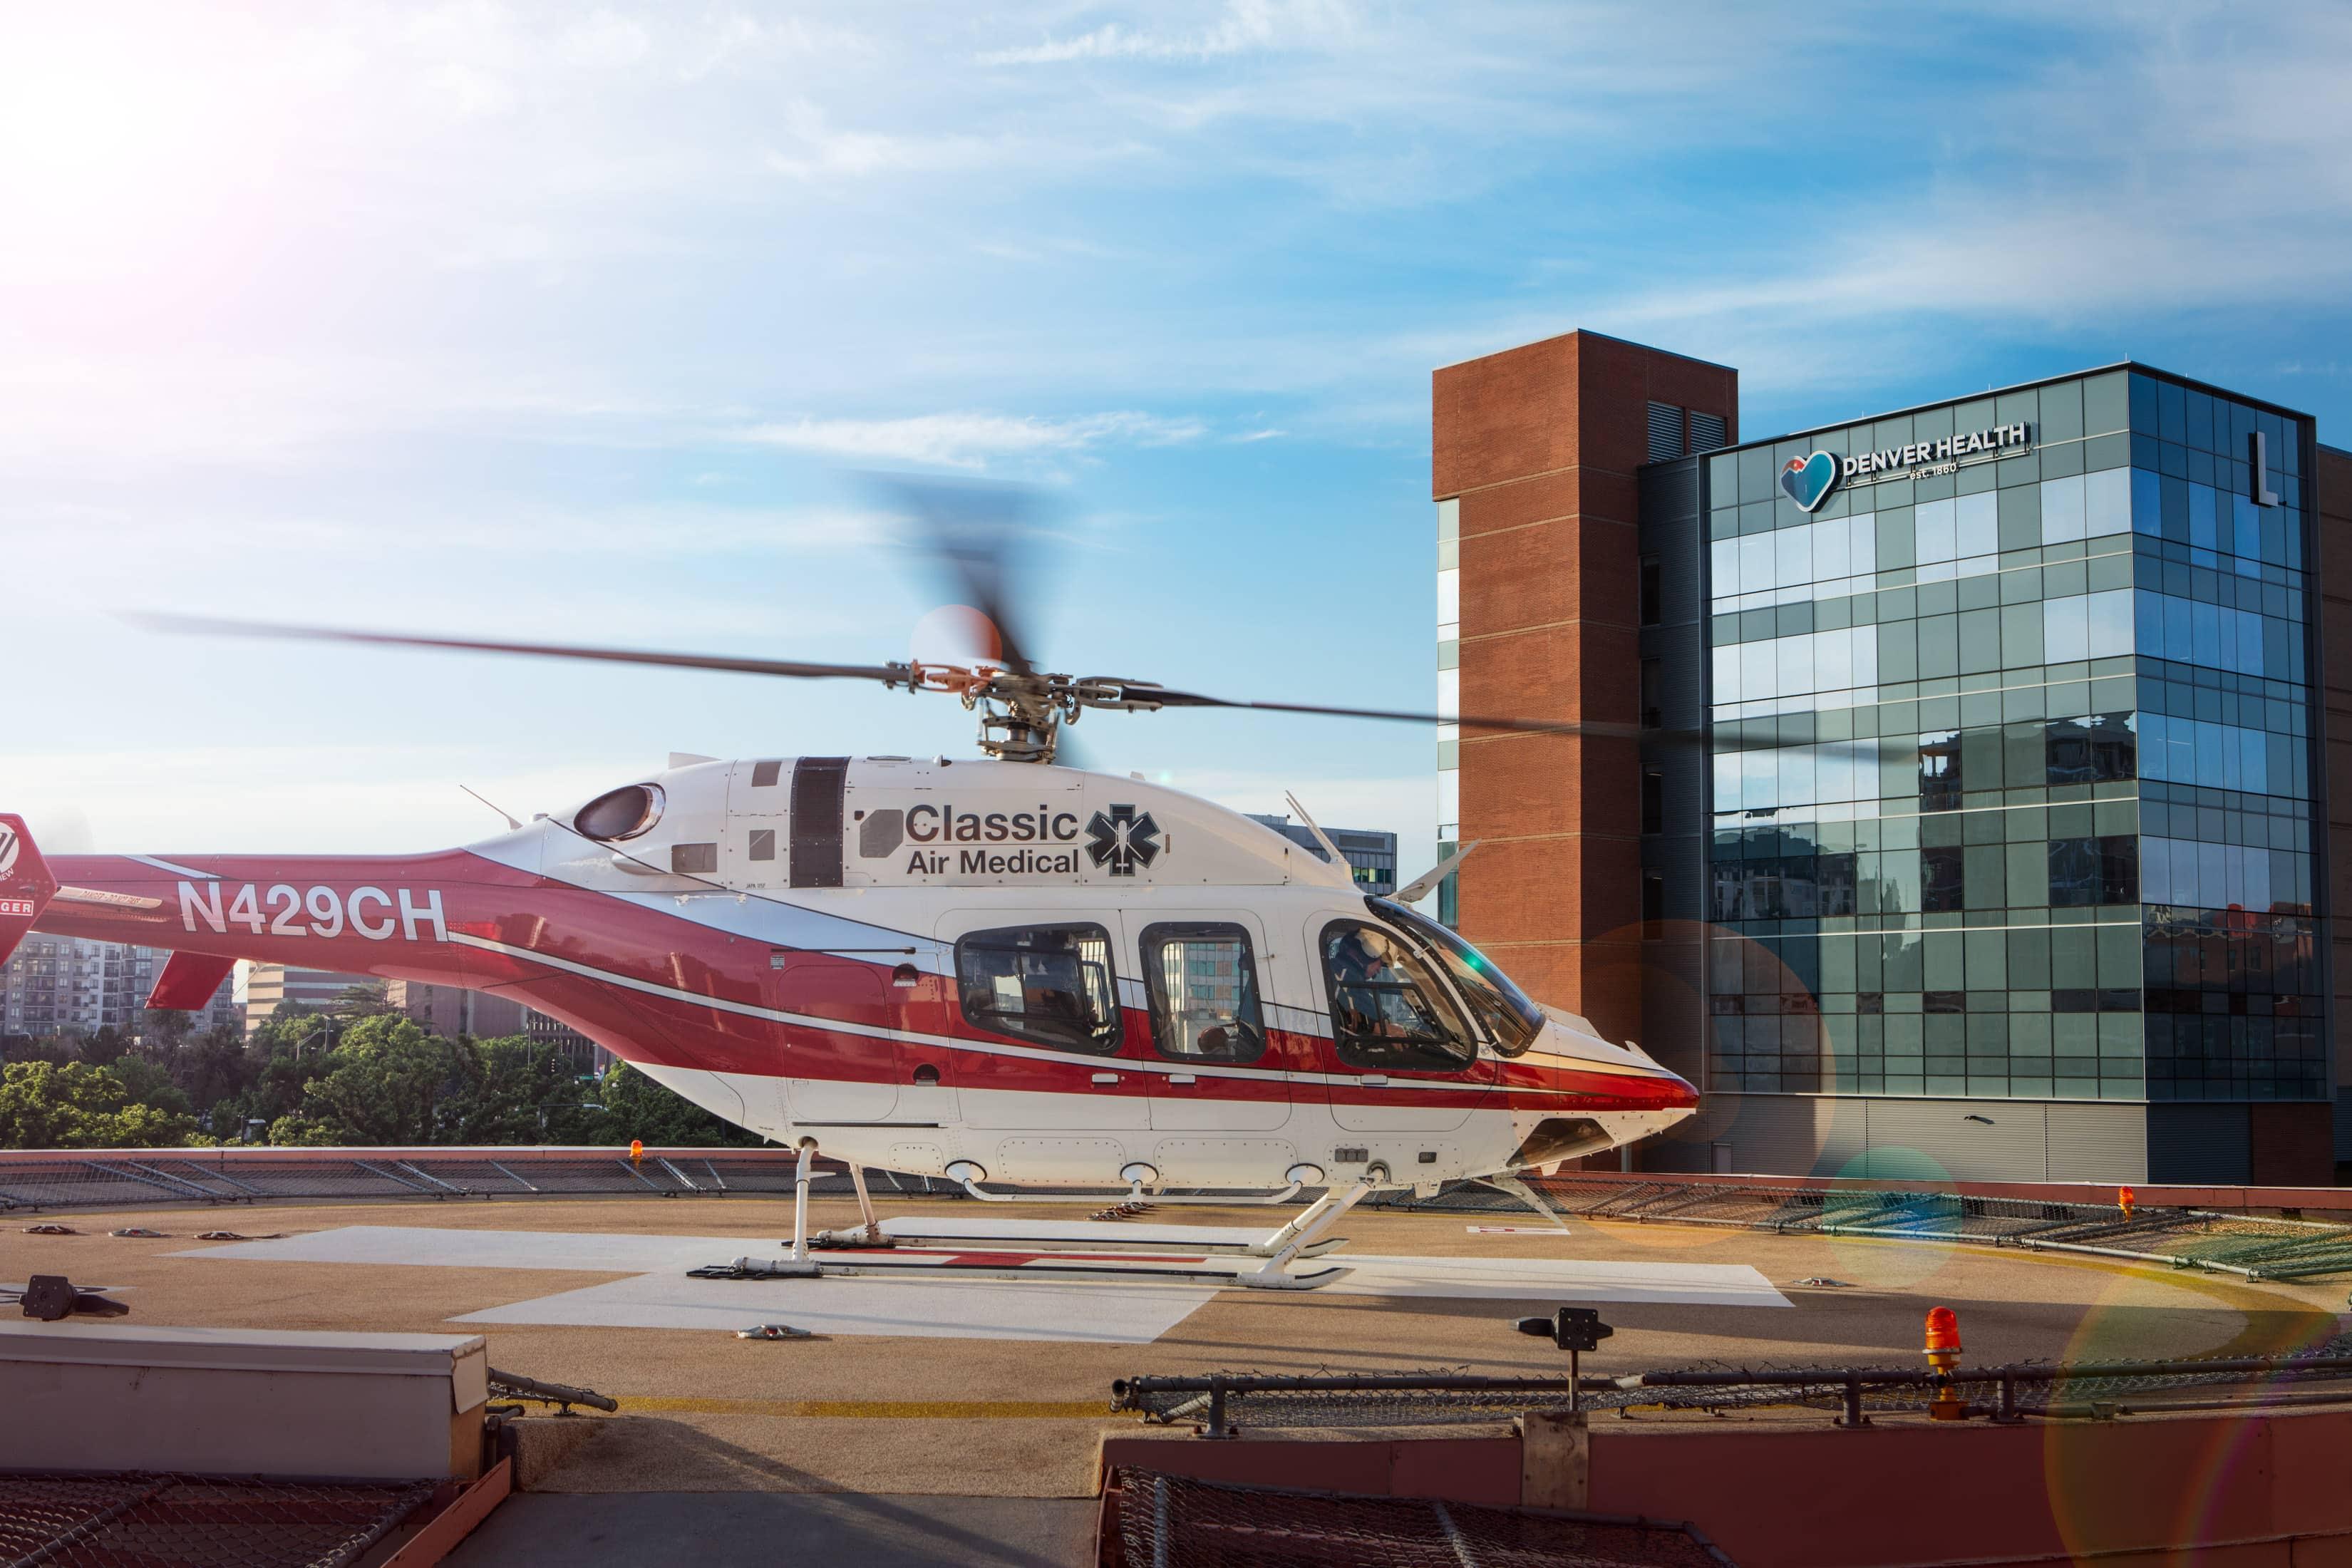 Denver Health hospital helicoper medivac